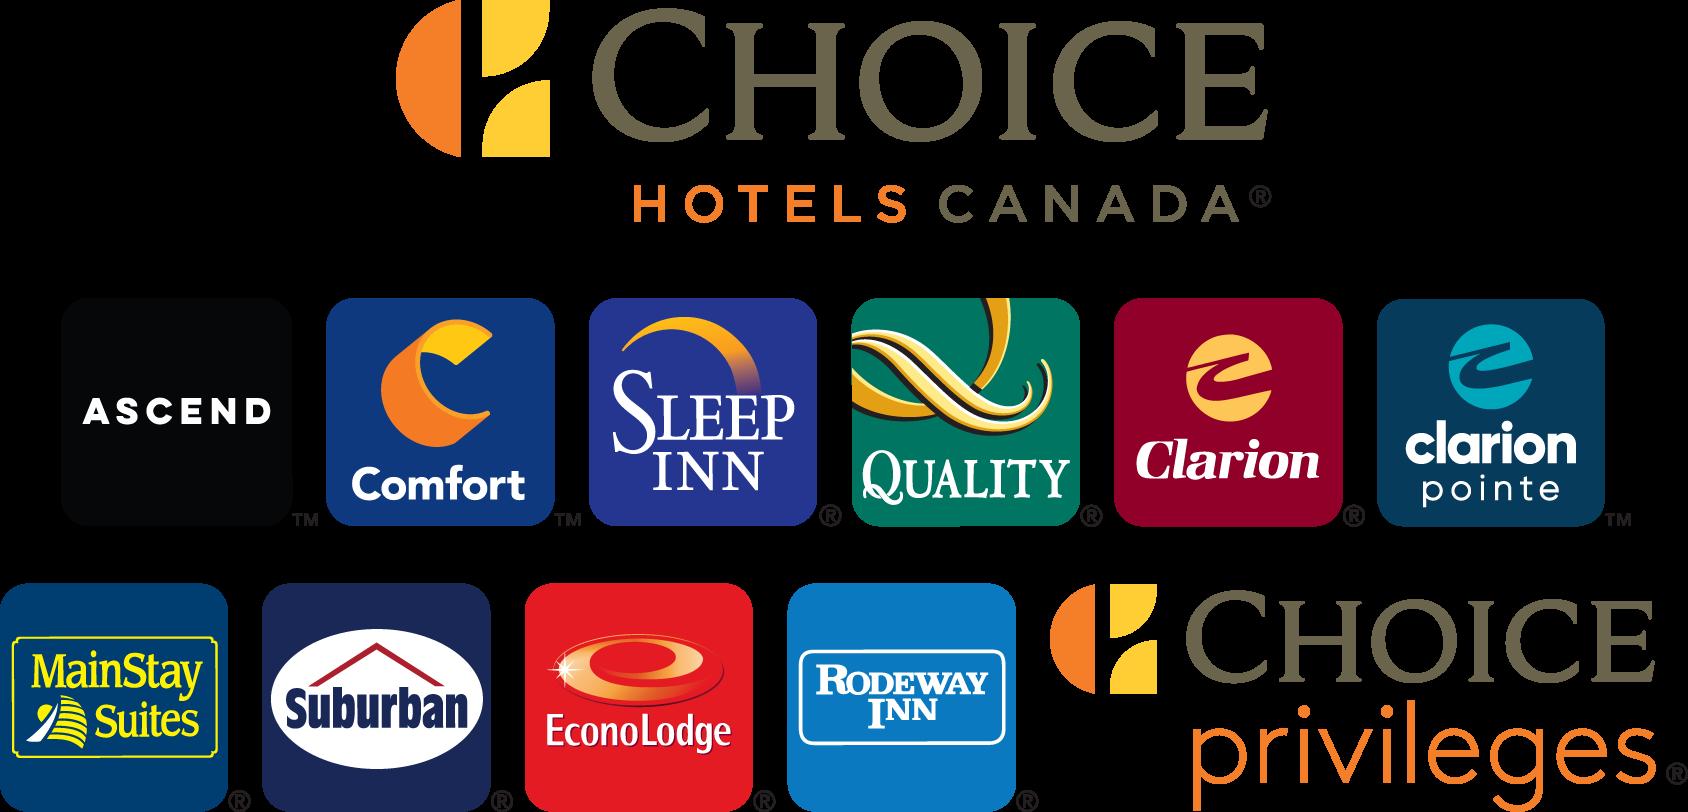 Nouveau Logo Choice Hotels Canada Mars 2020 Gros